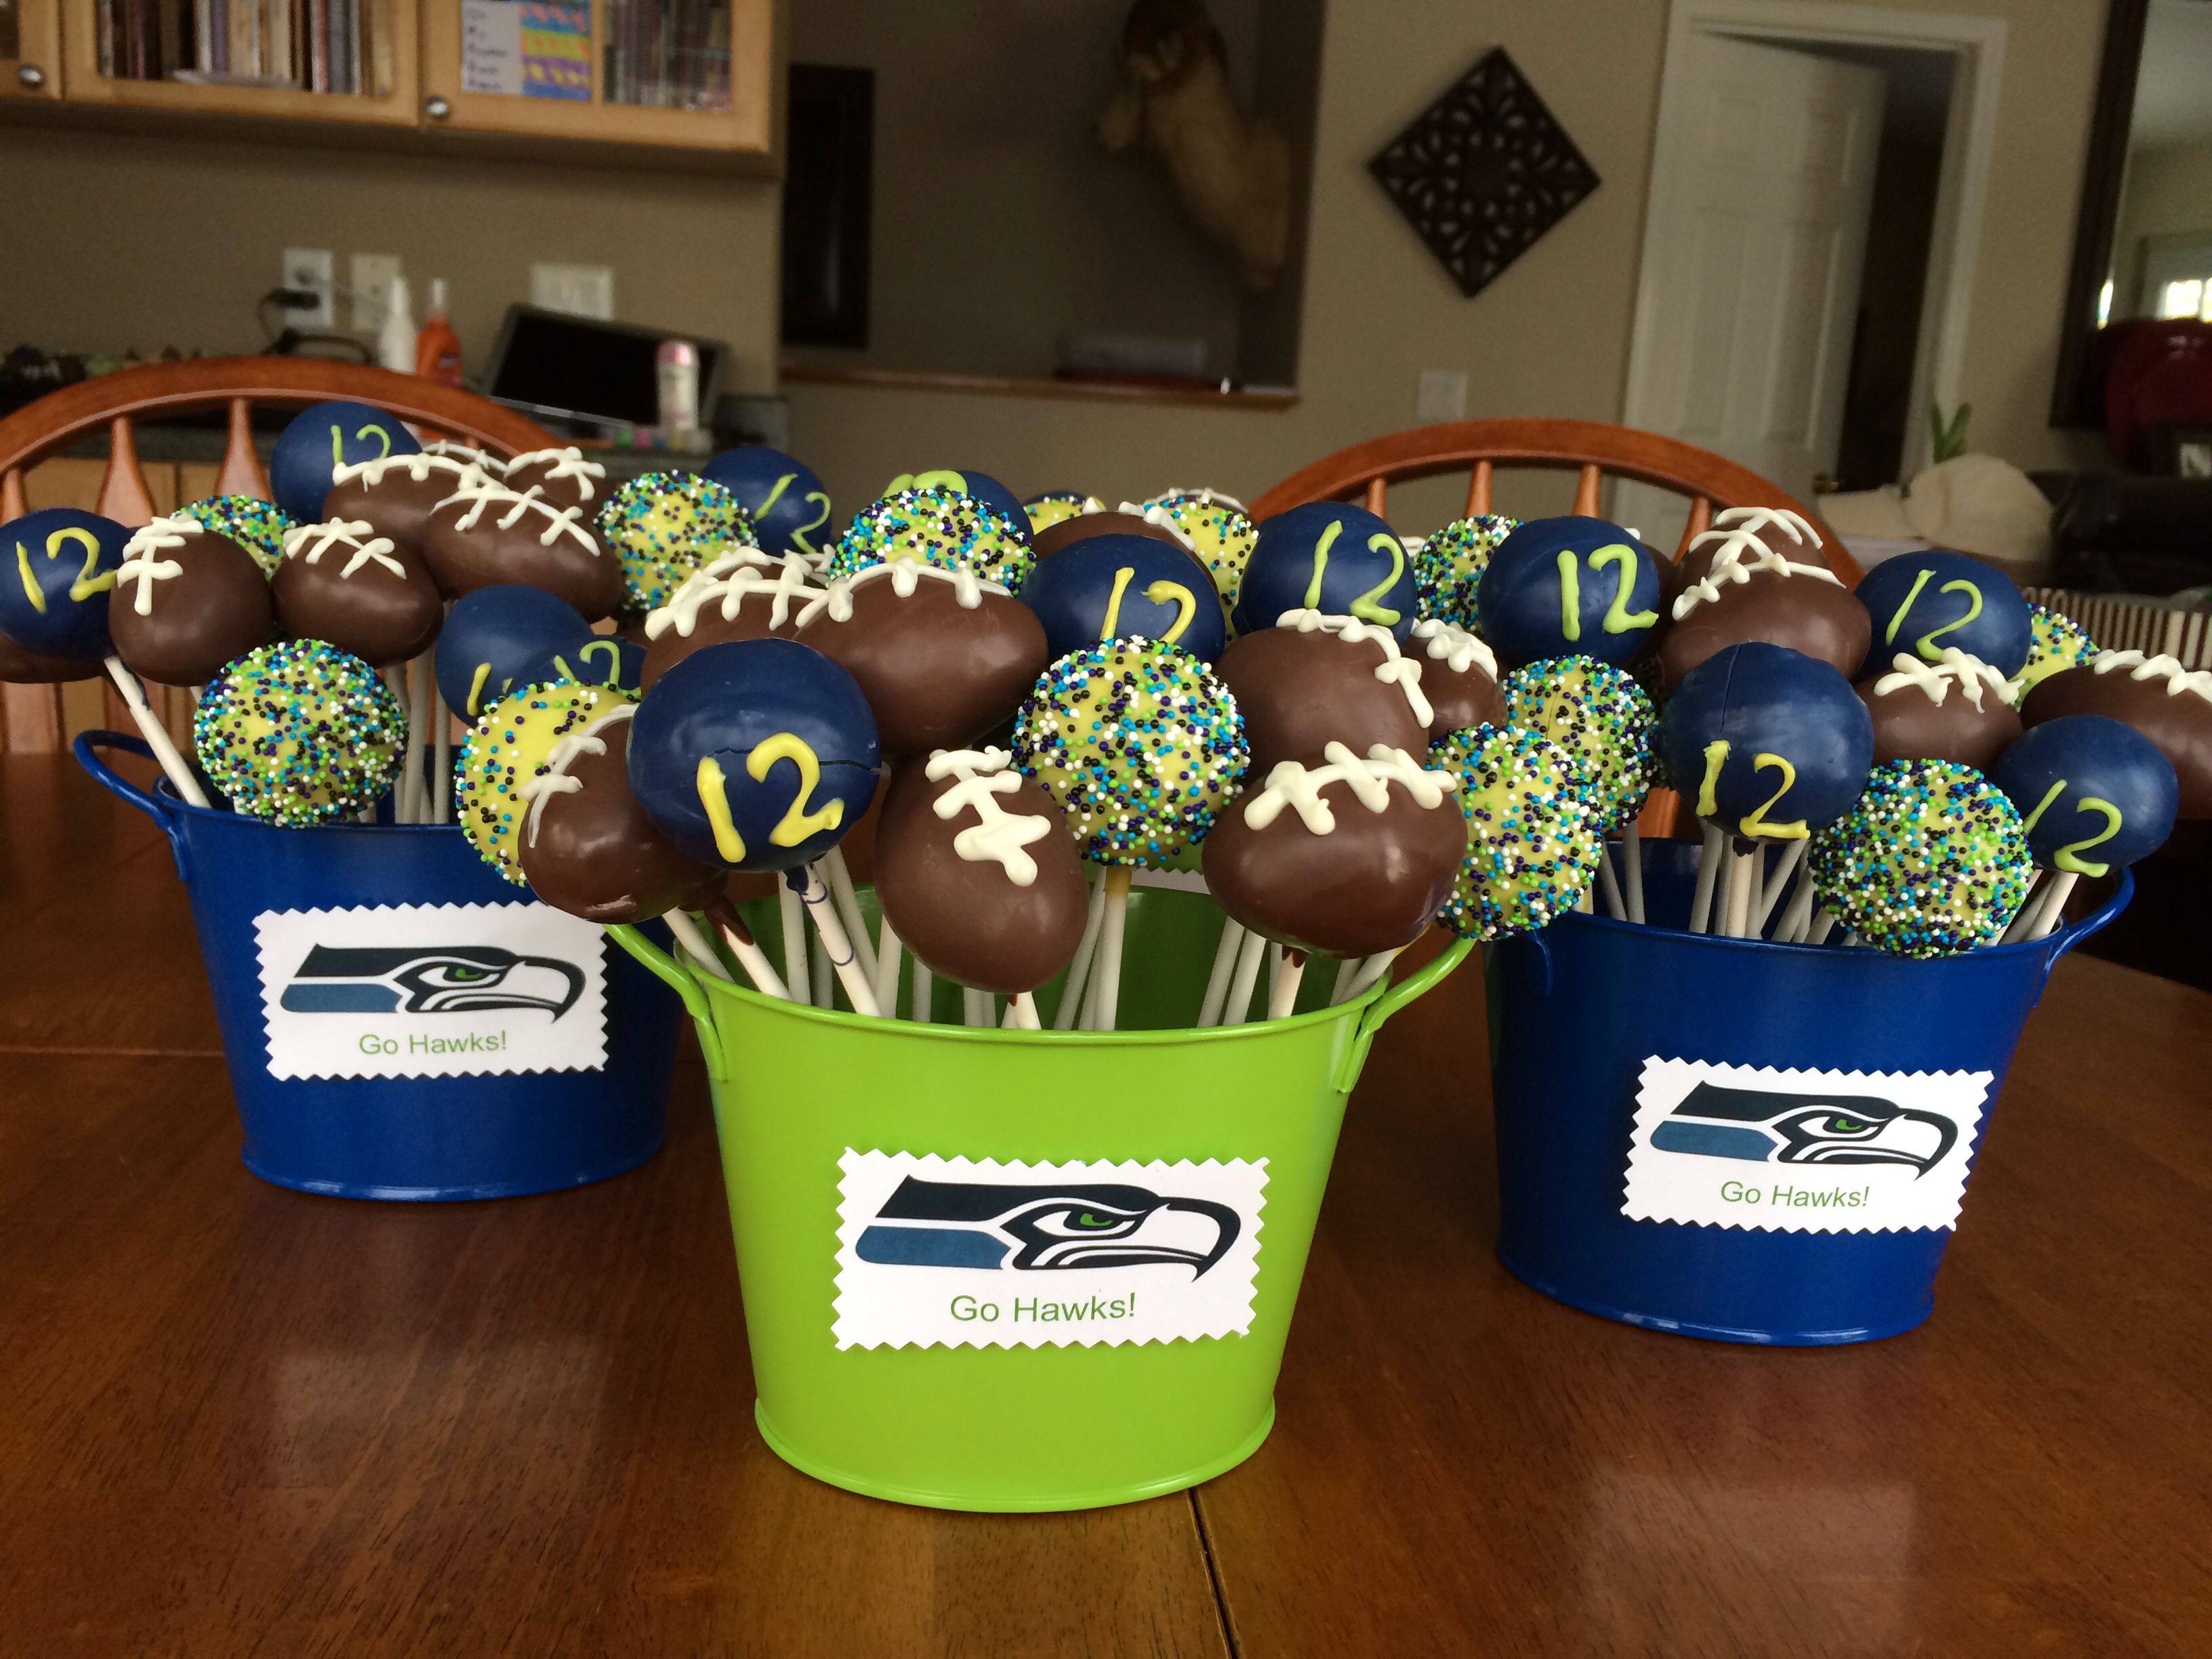 Seahawk Super Bowl Cake Pops!